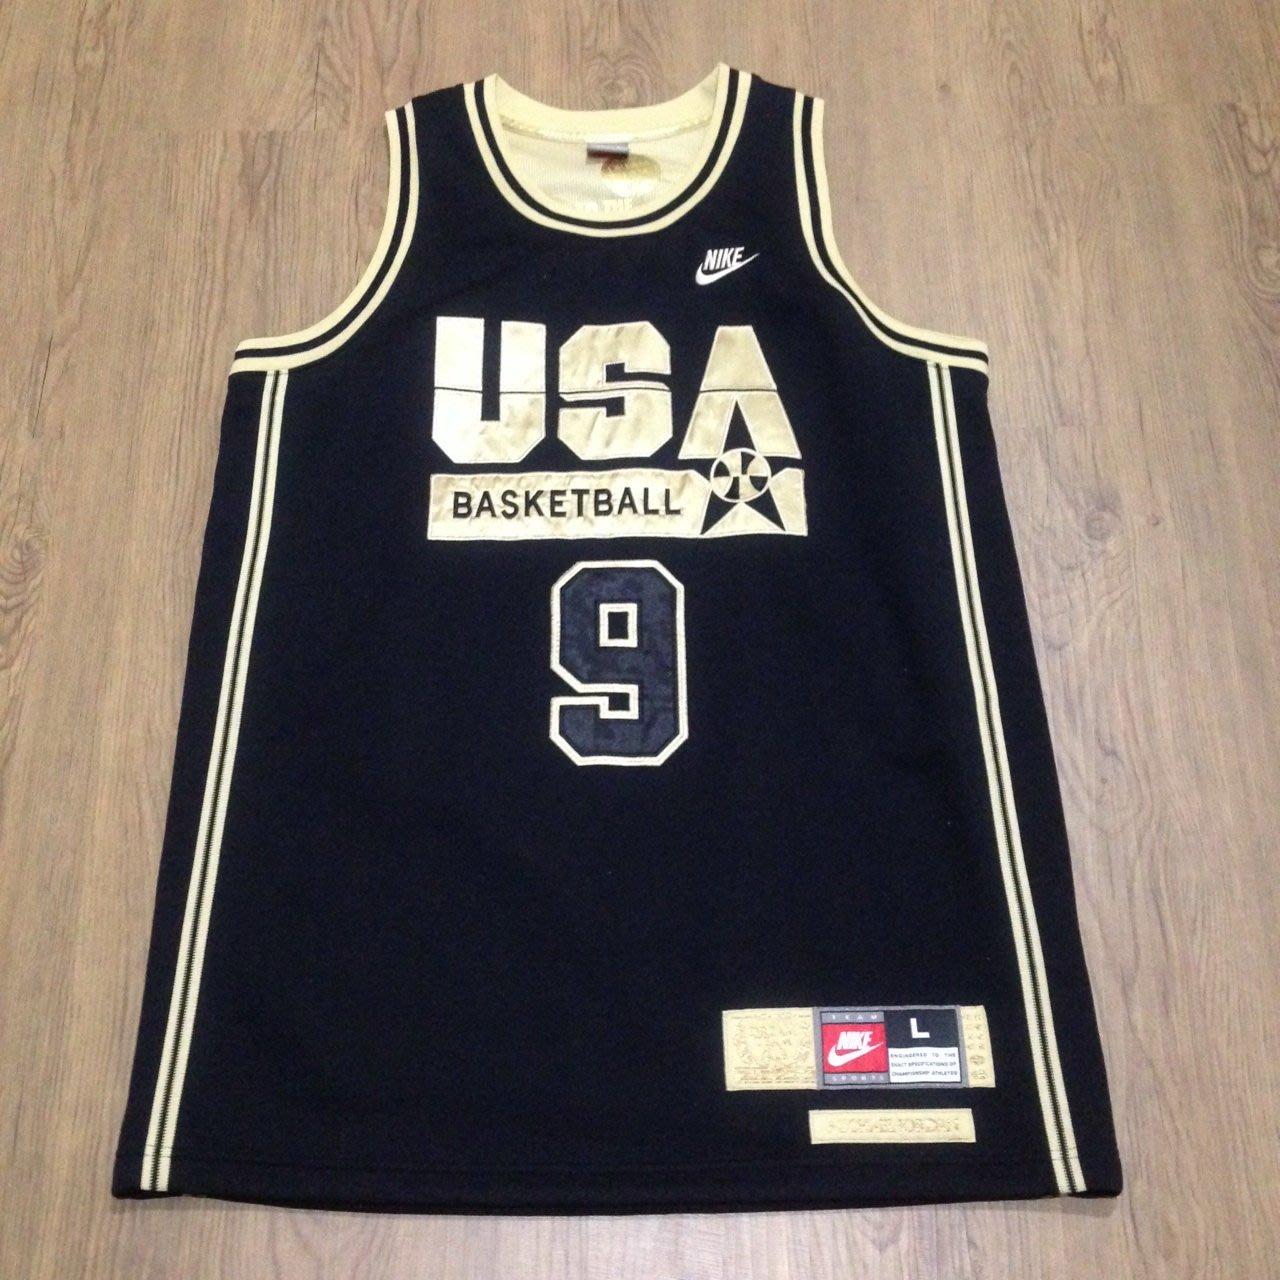 online retailer af728 2a579 NIKE USA MICHAEL JORDAN OLYMPIC JERSEY 1992 巴塞隆納奧運喬丹 ...